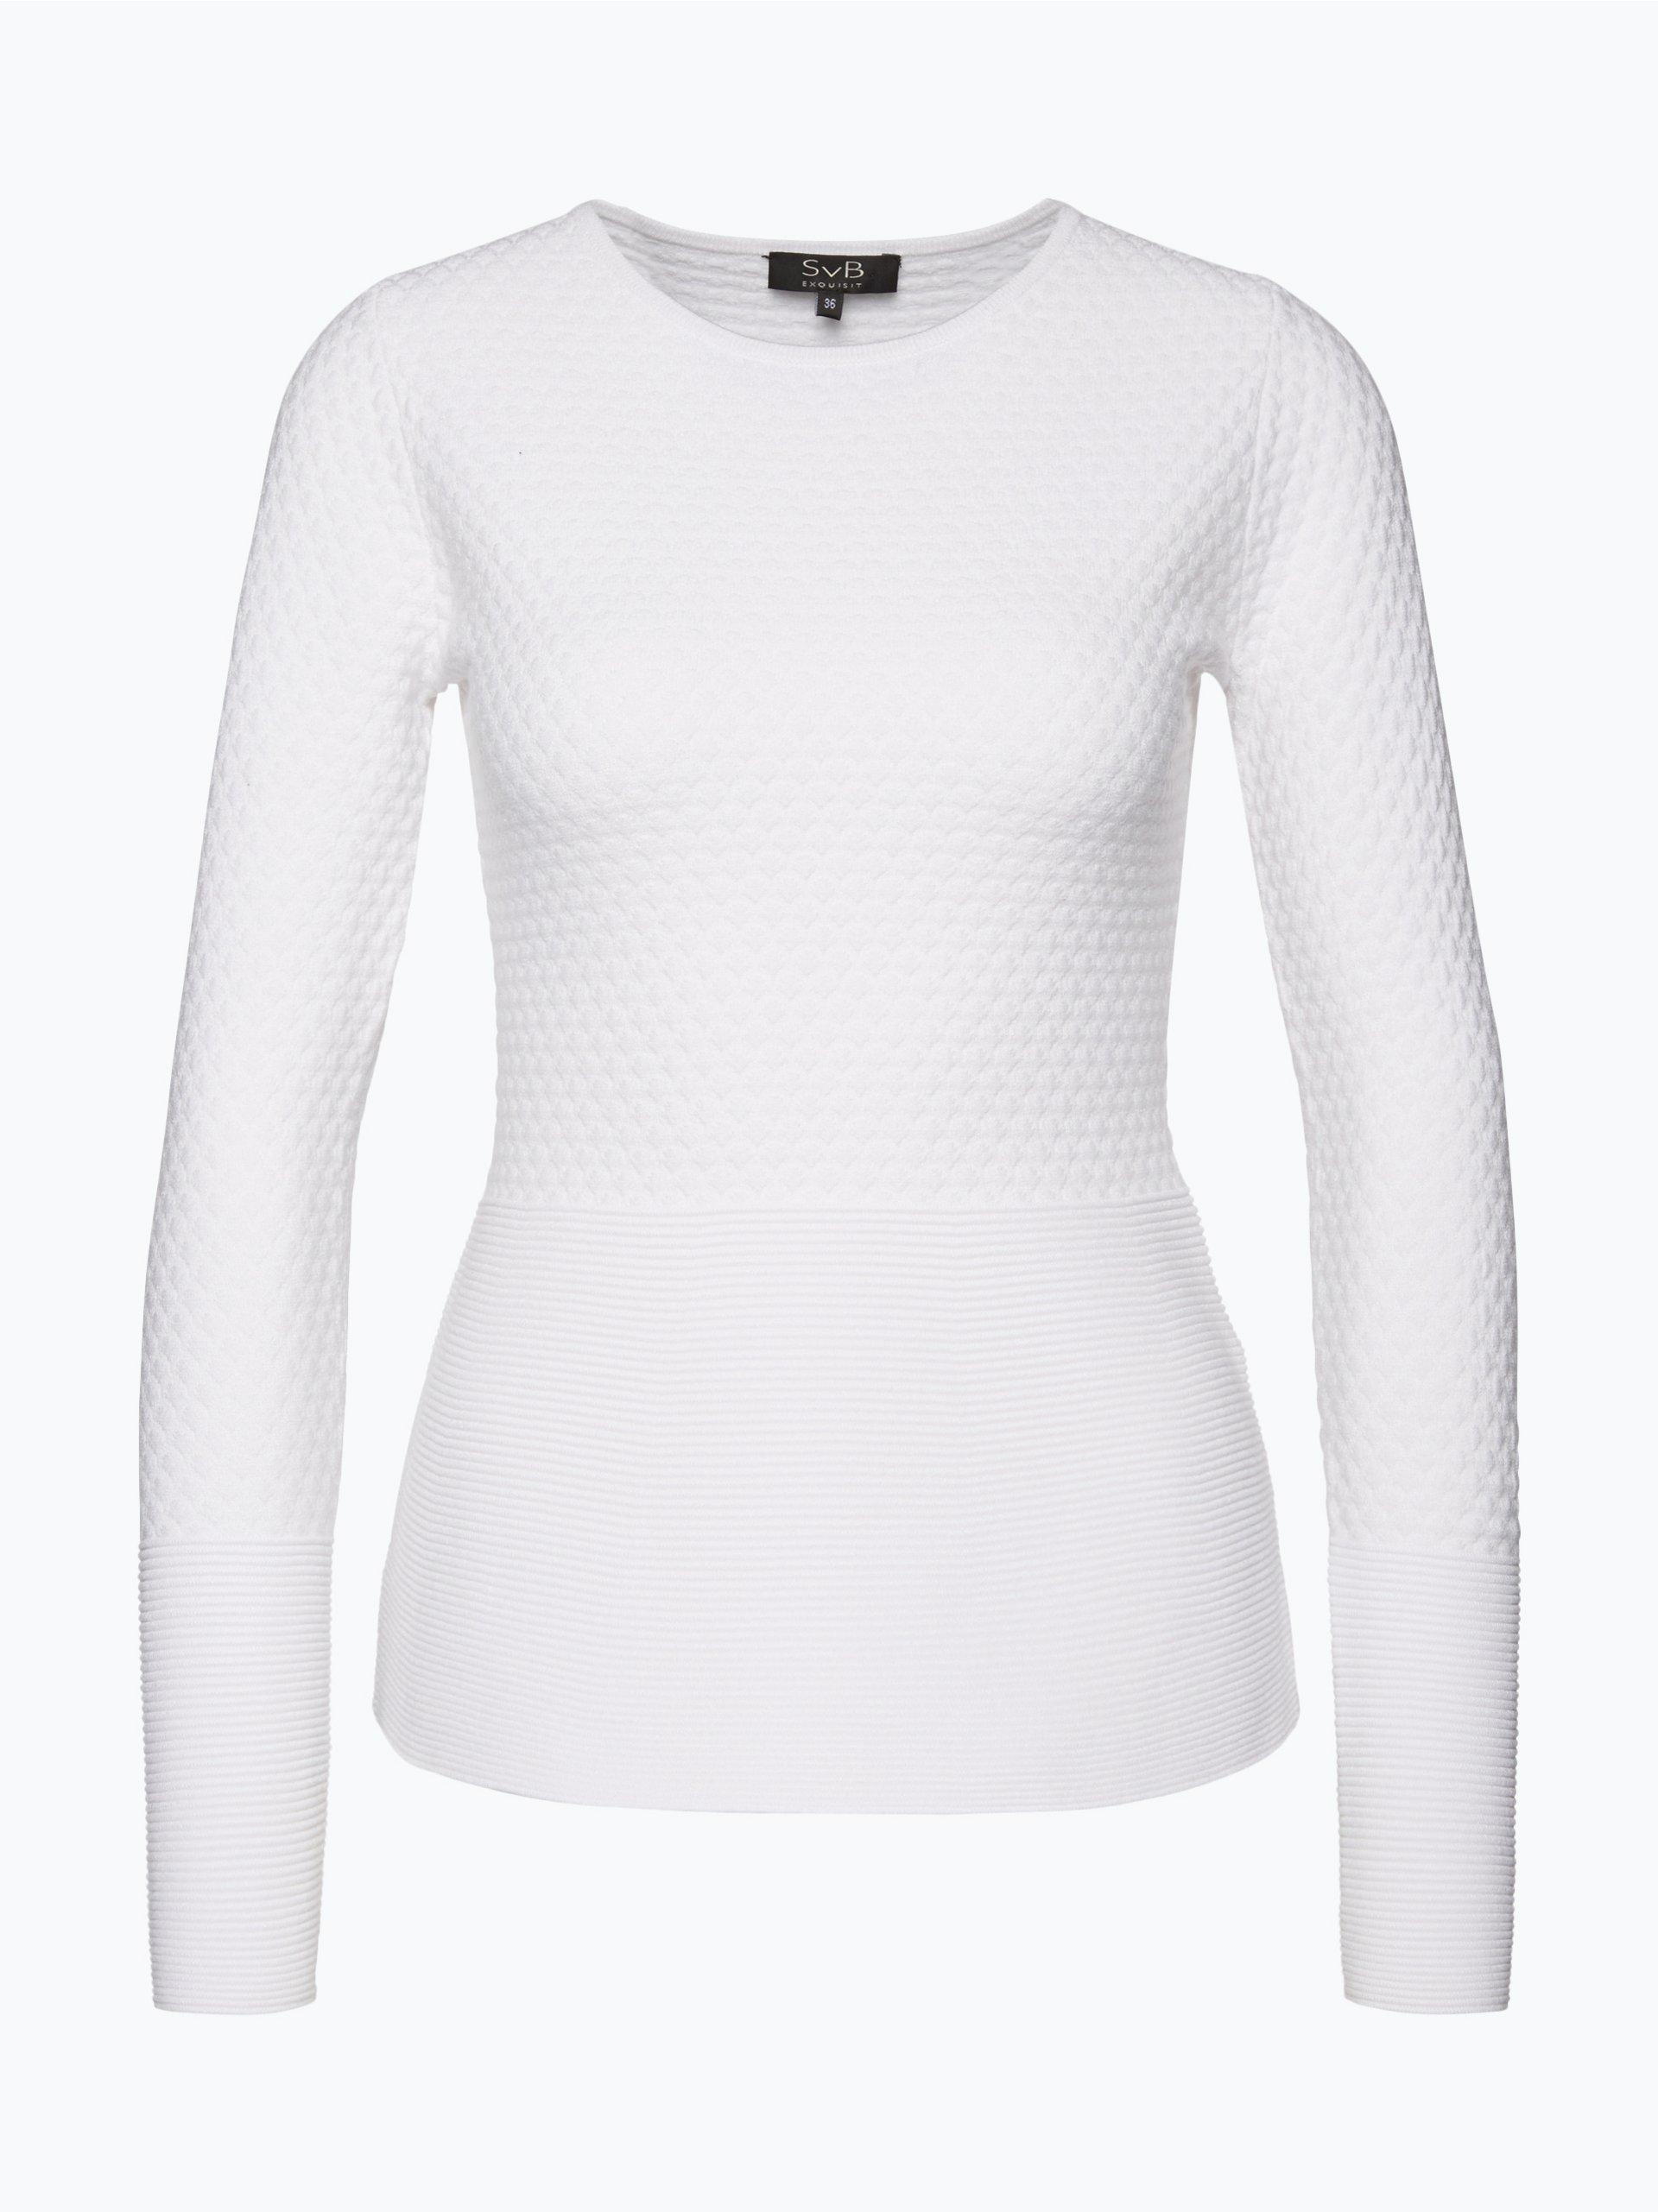 svb exquisit damen pullover wei uni online kaufen peek. Black Bedroom Furniture Sets. Home Design Ideas